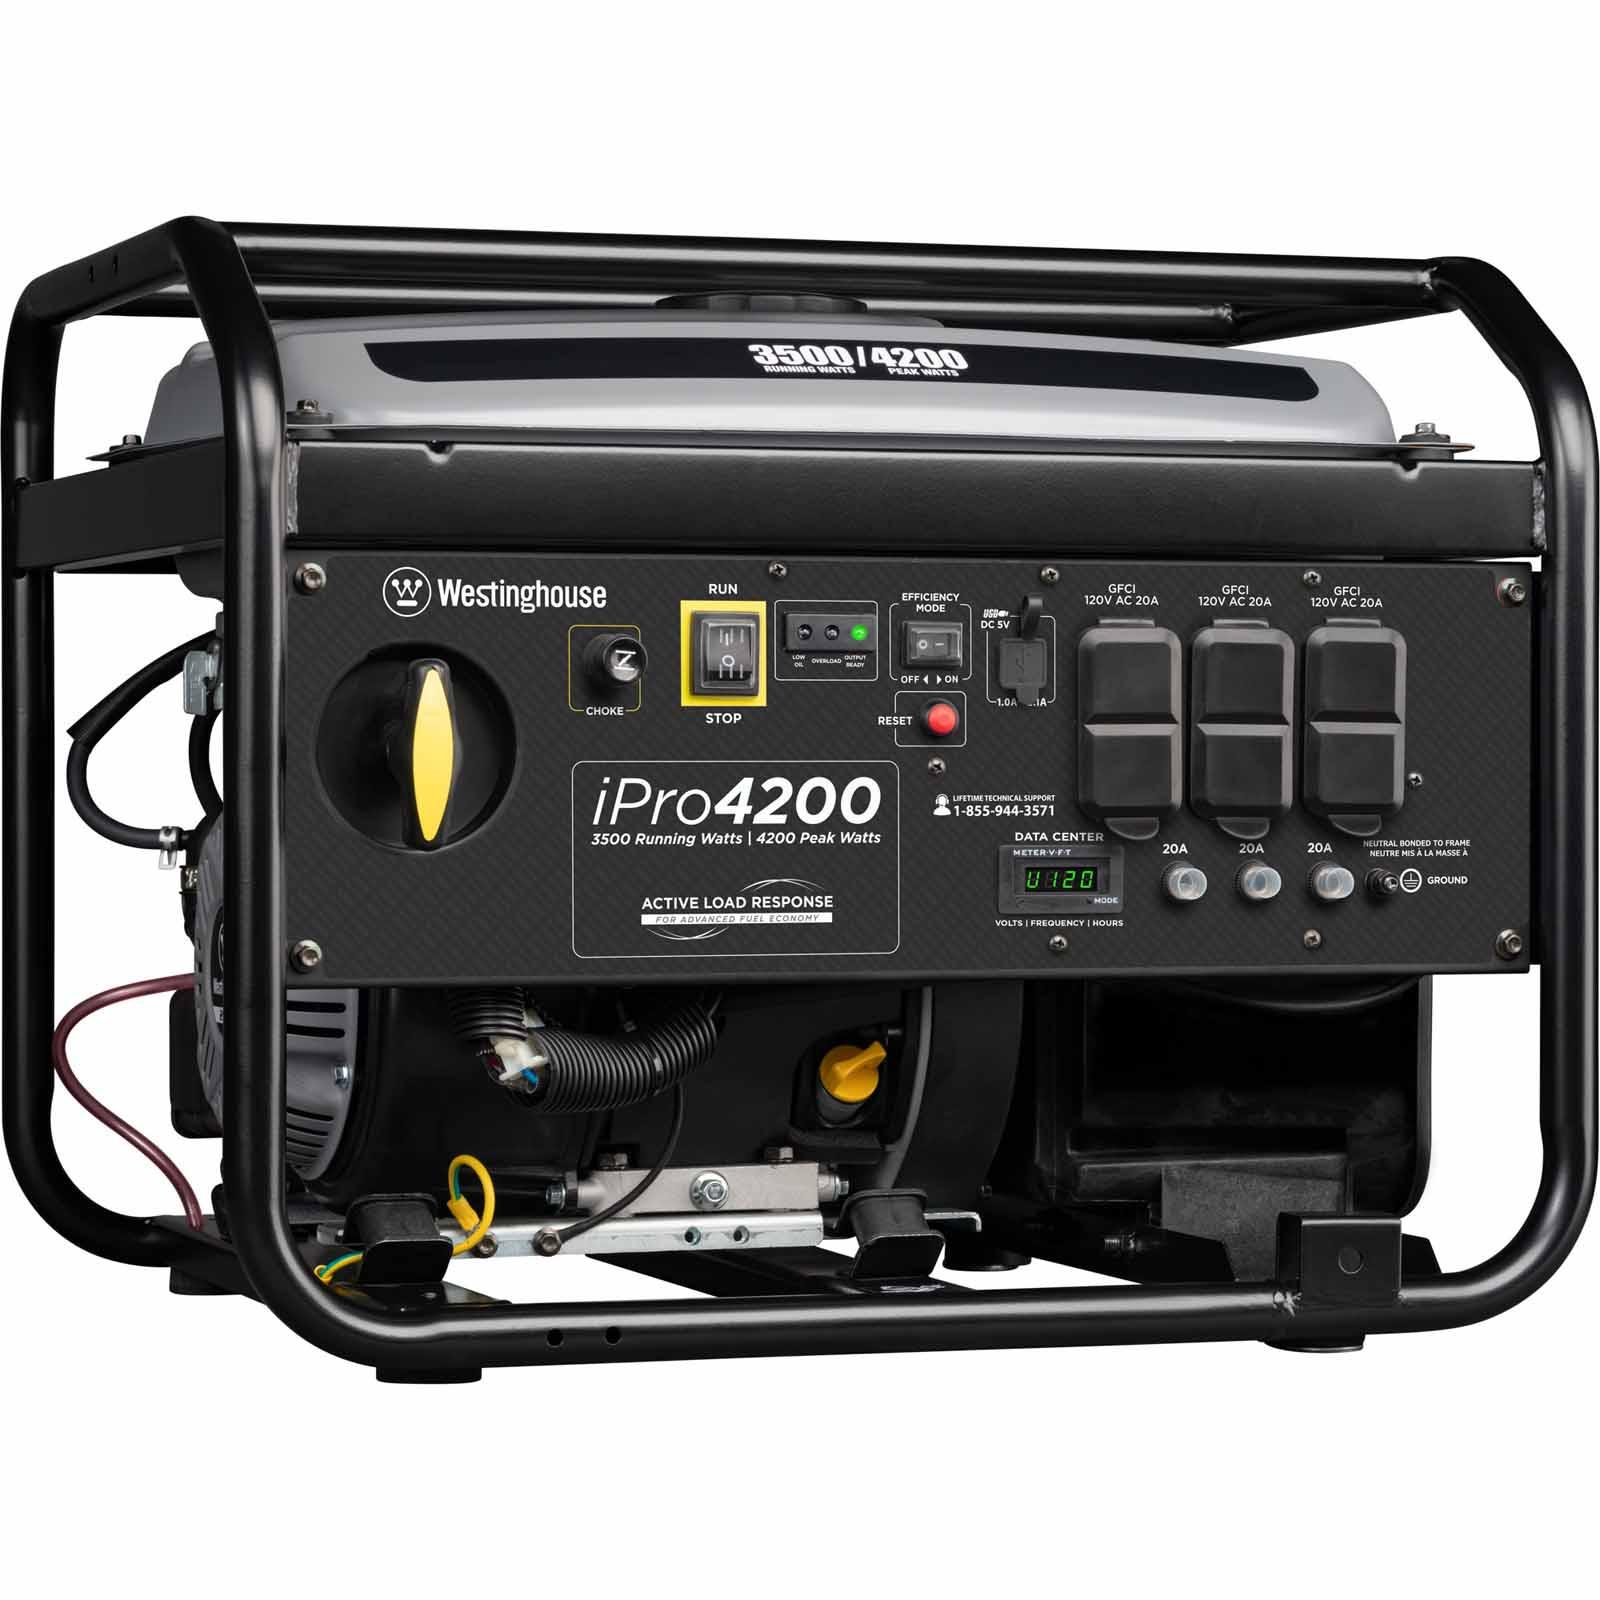 Westinghouse iPro4200 - 4,200-Peak Watts Portable Inverter Generator